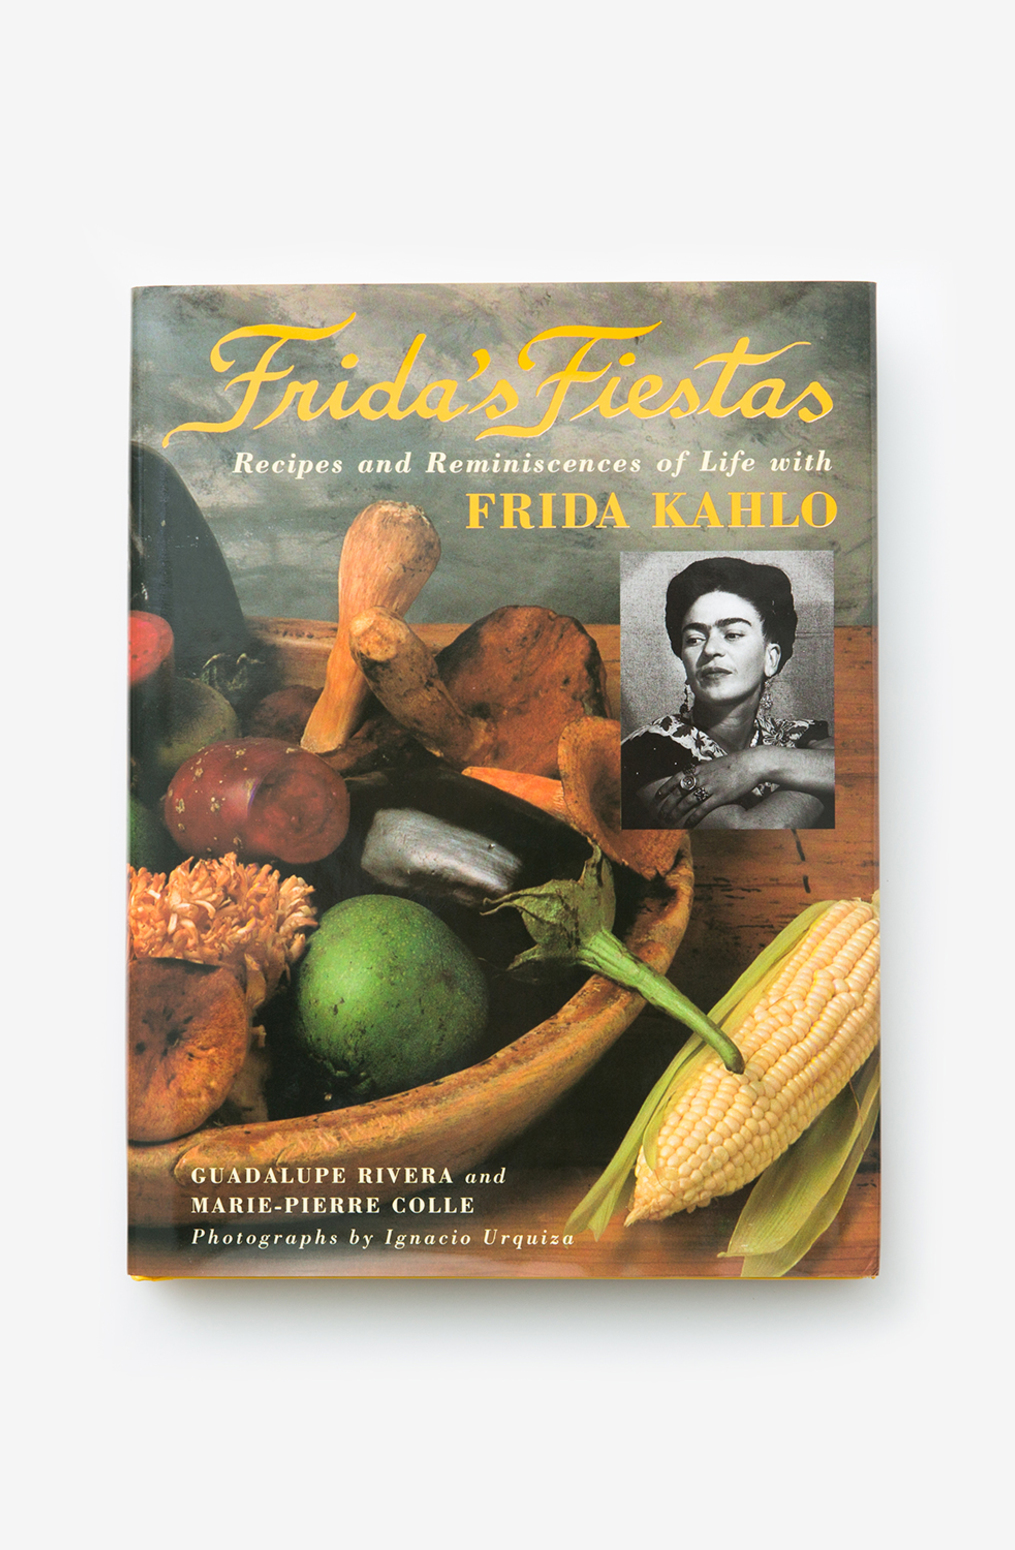 Fridas fiestas cookbook alabama chanin 1